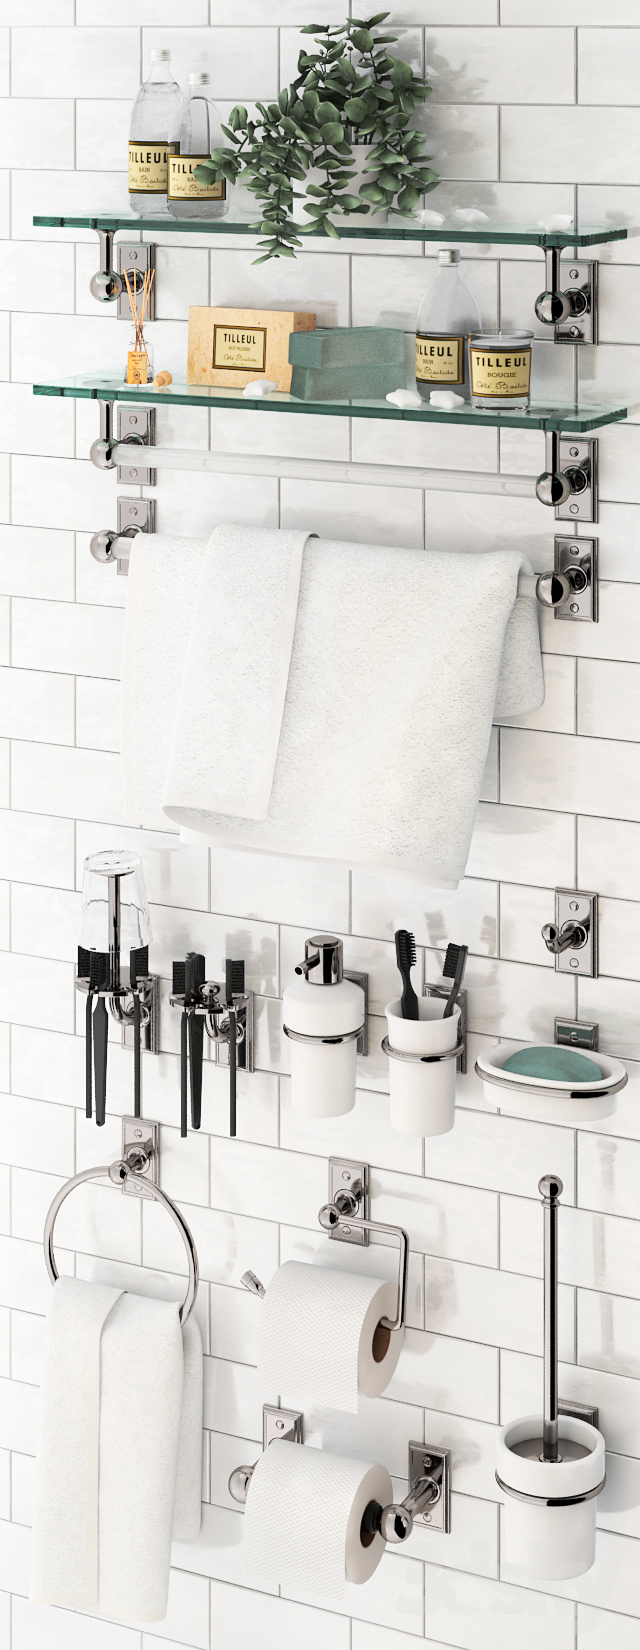 Bathroom accessories Nanzaquatic. Collections: Georgian, Moderne, Federal.